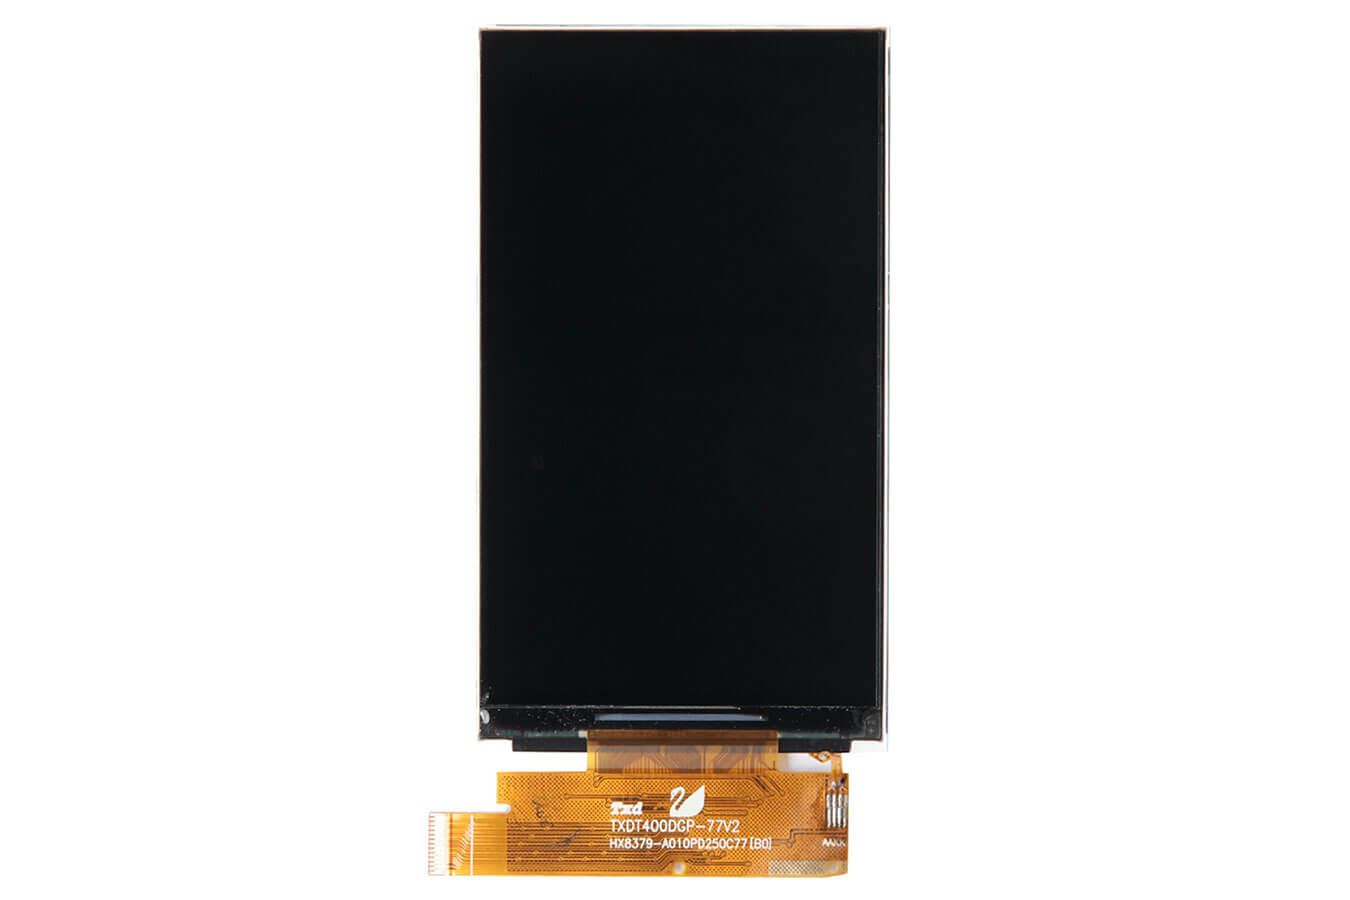 Картинка Дисплей Explay Tornado (GSM) от магазина NBS Parts